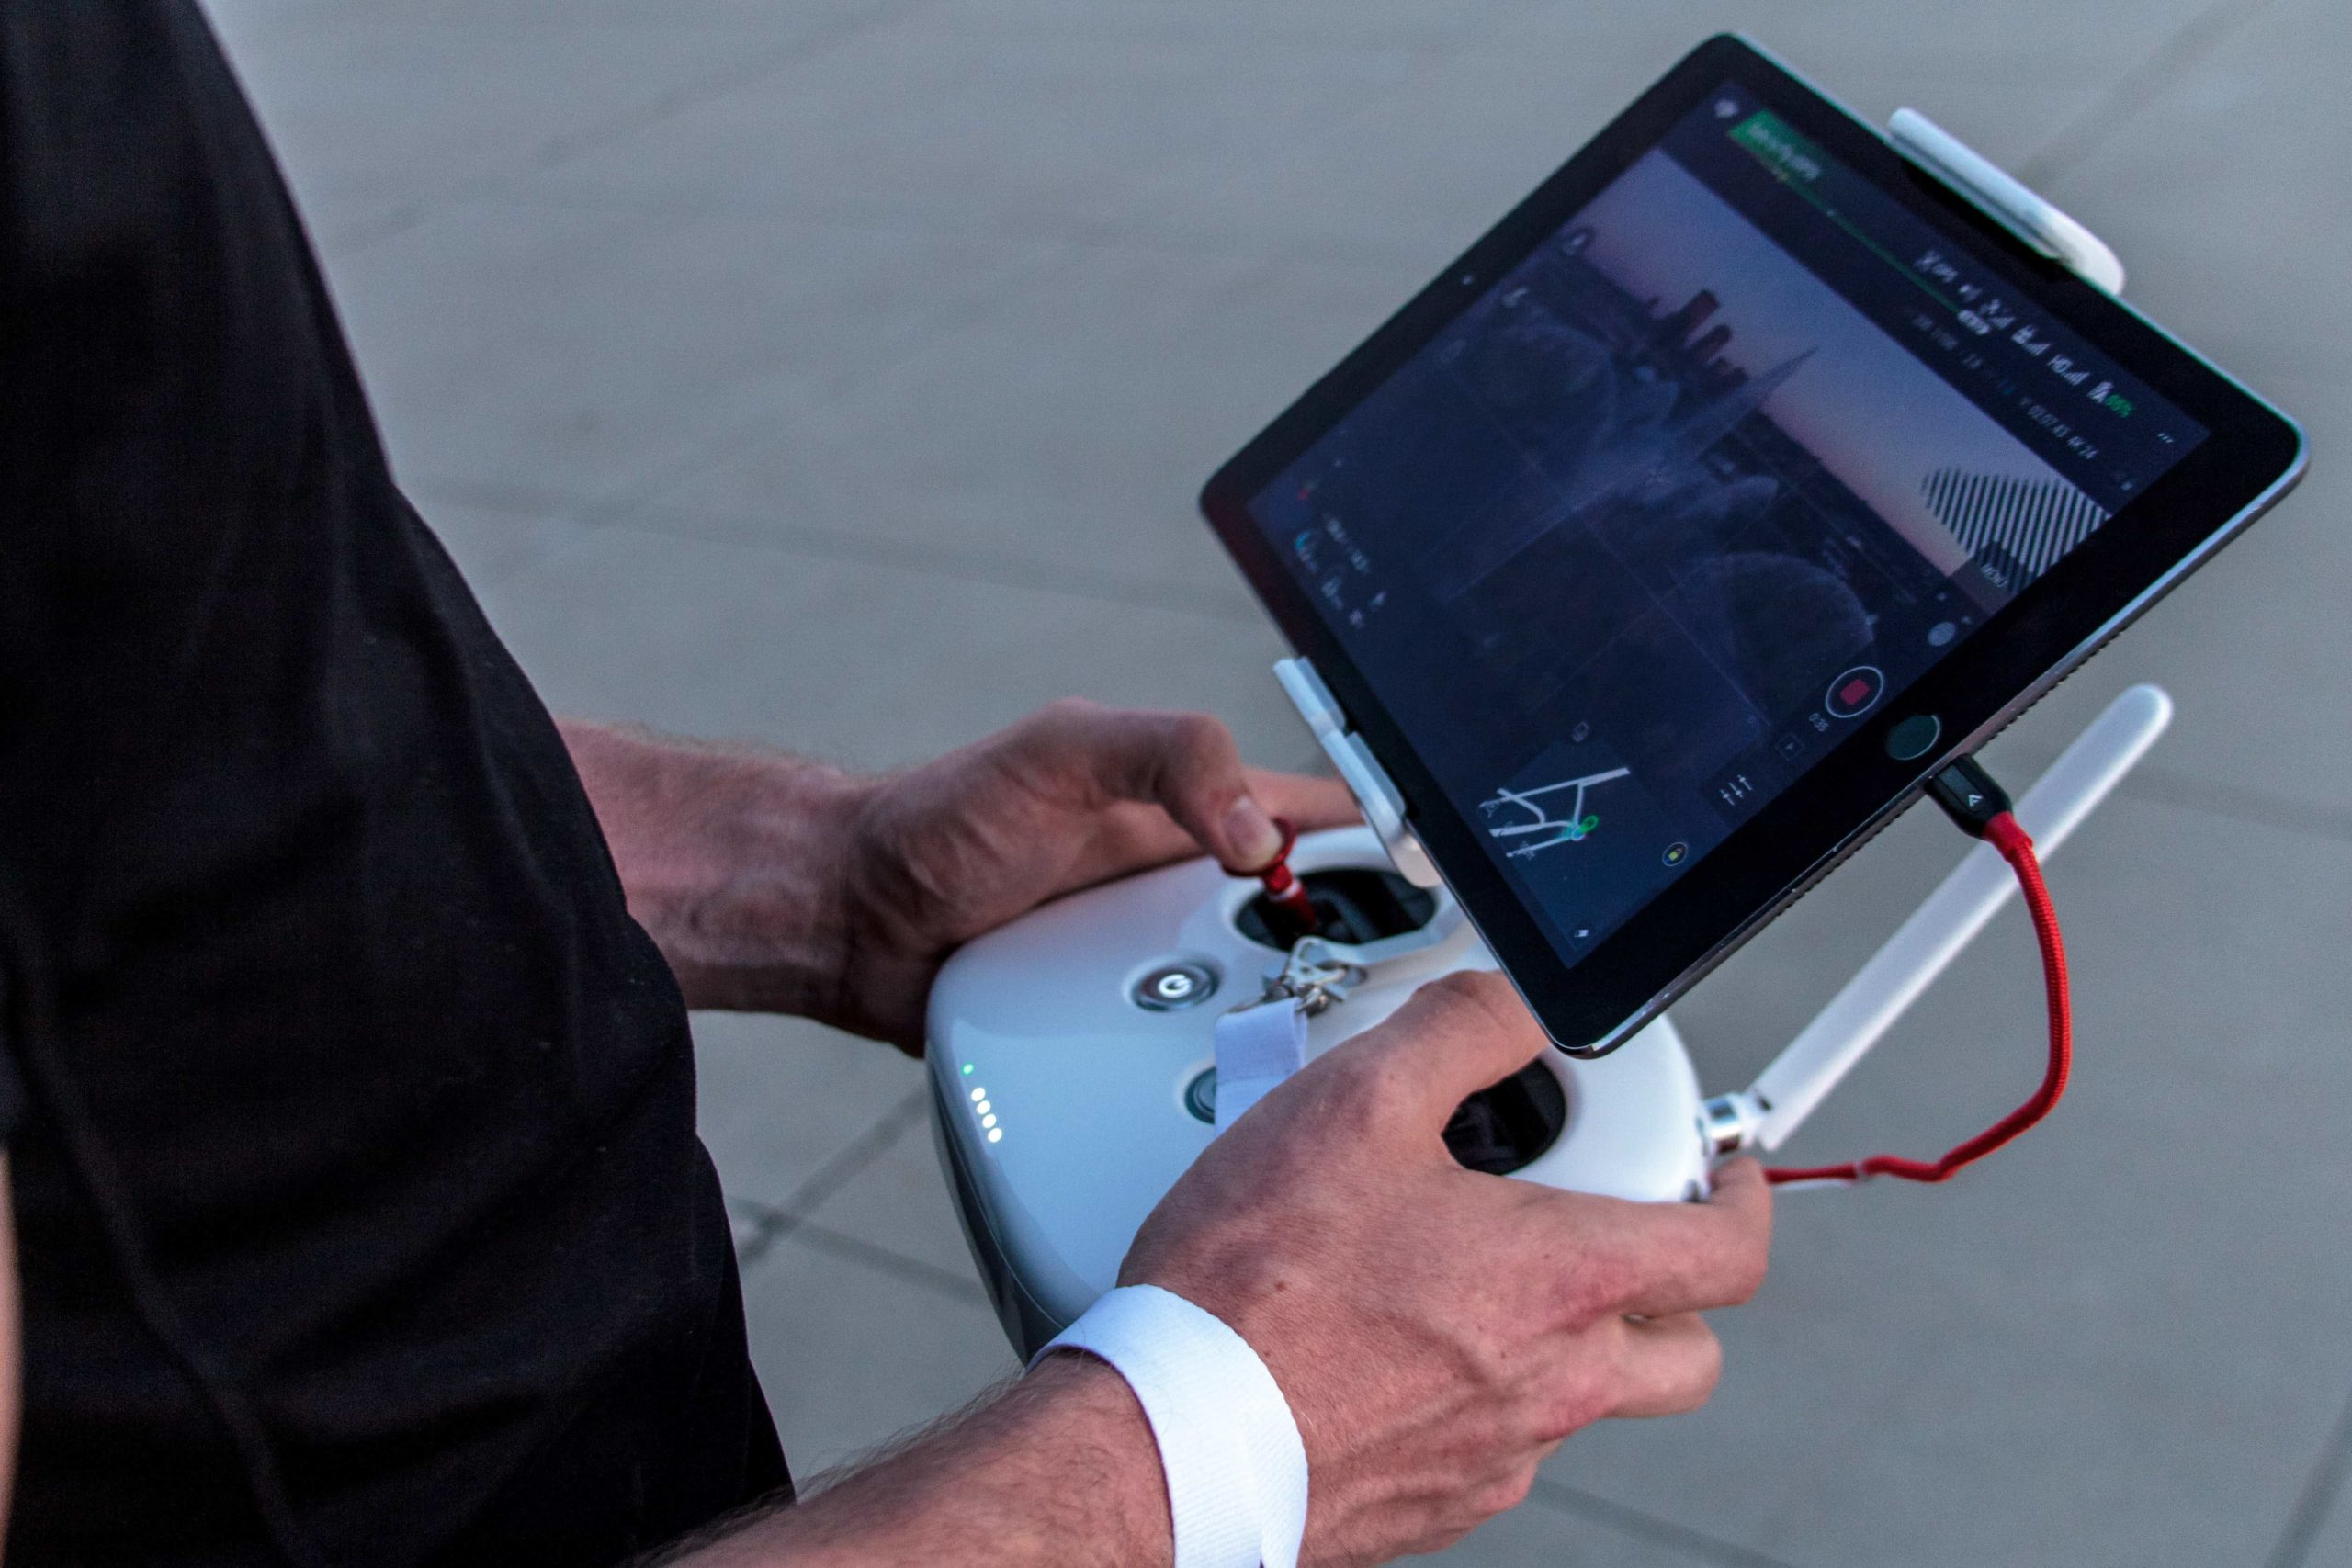 drones solutions to fight coronavirus